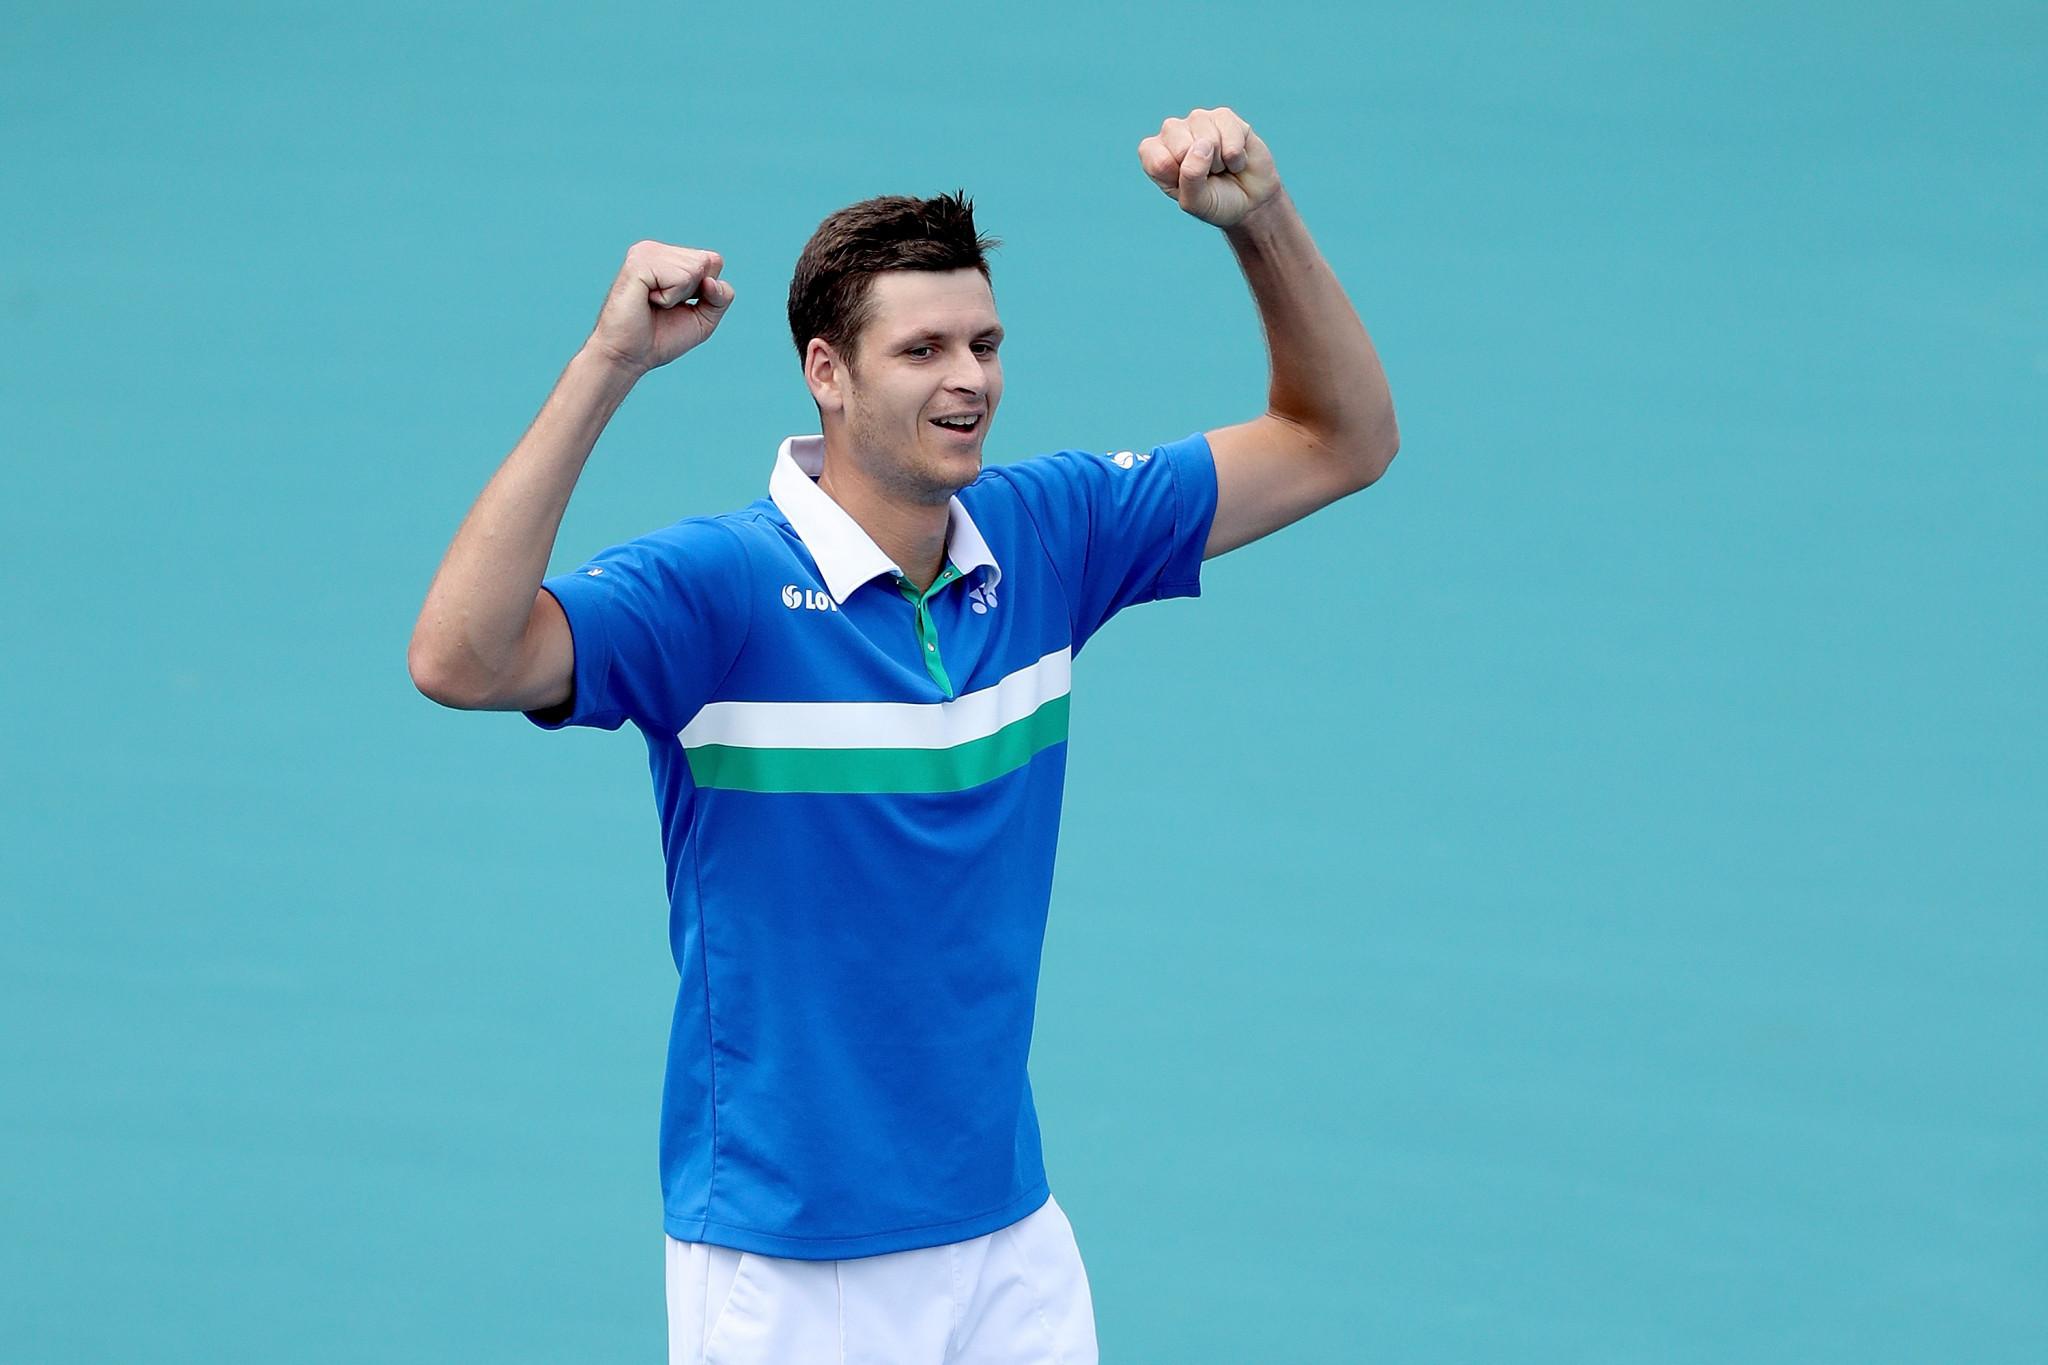 Hurkacz wins underdog men's singles final at Miami Open